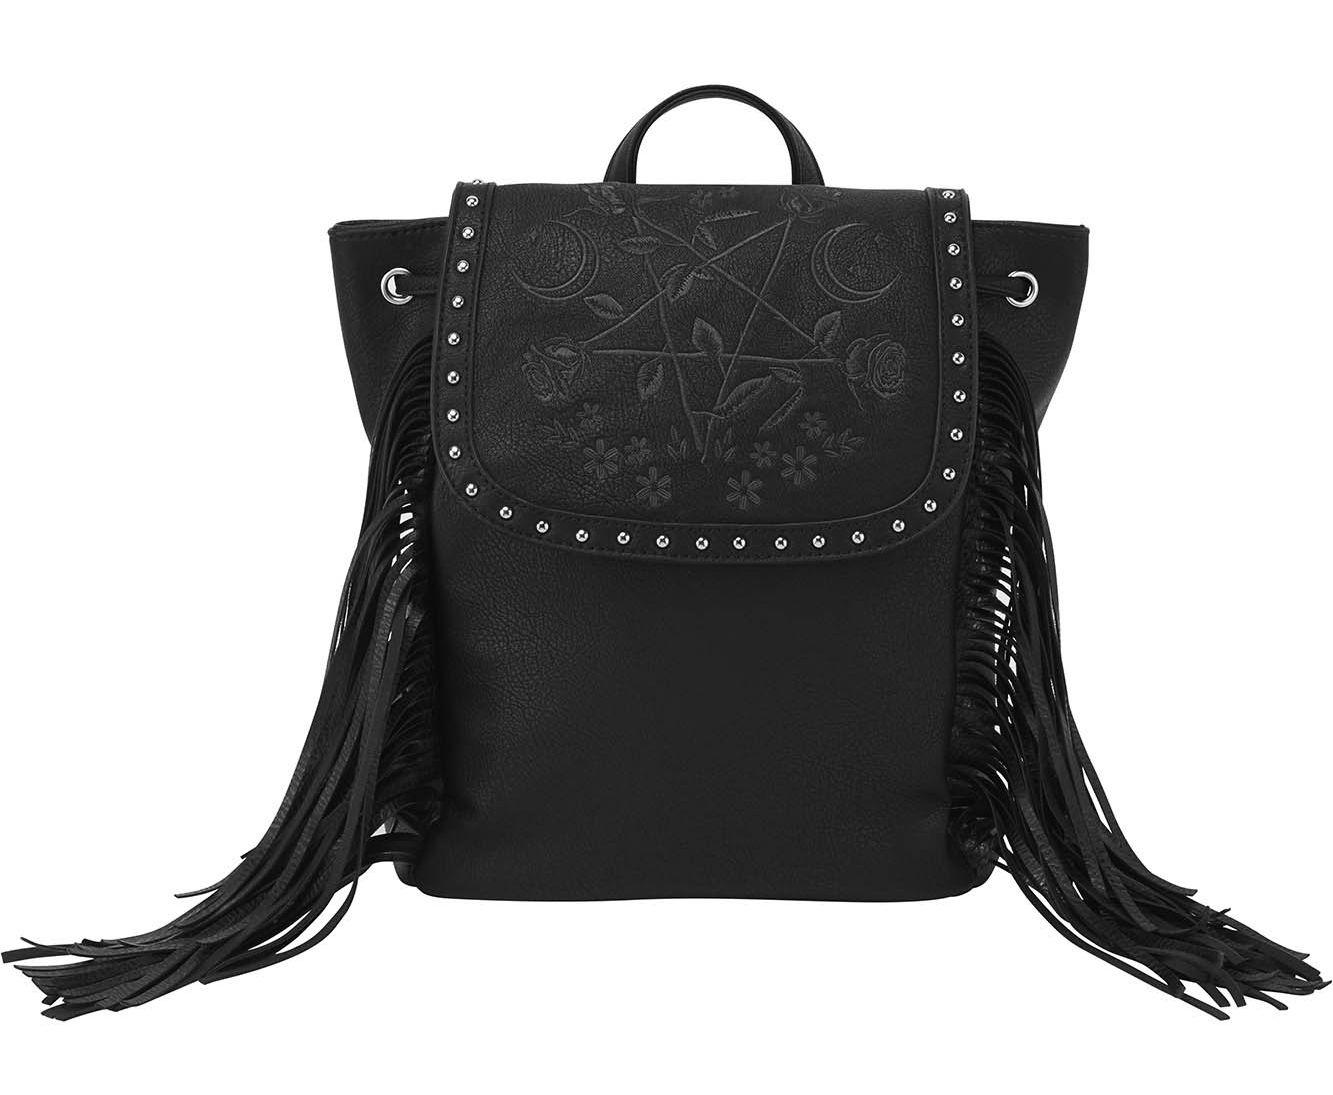 ks0889_sac-a-dos-gothique-glam-rock-juniper-pentagramme